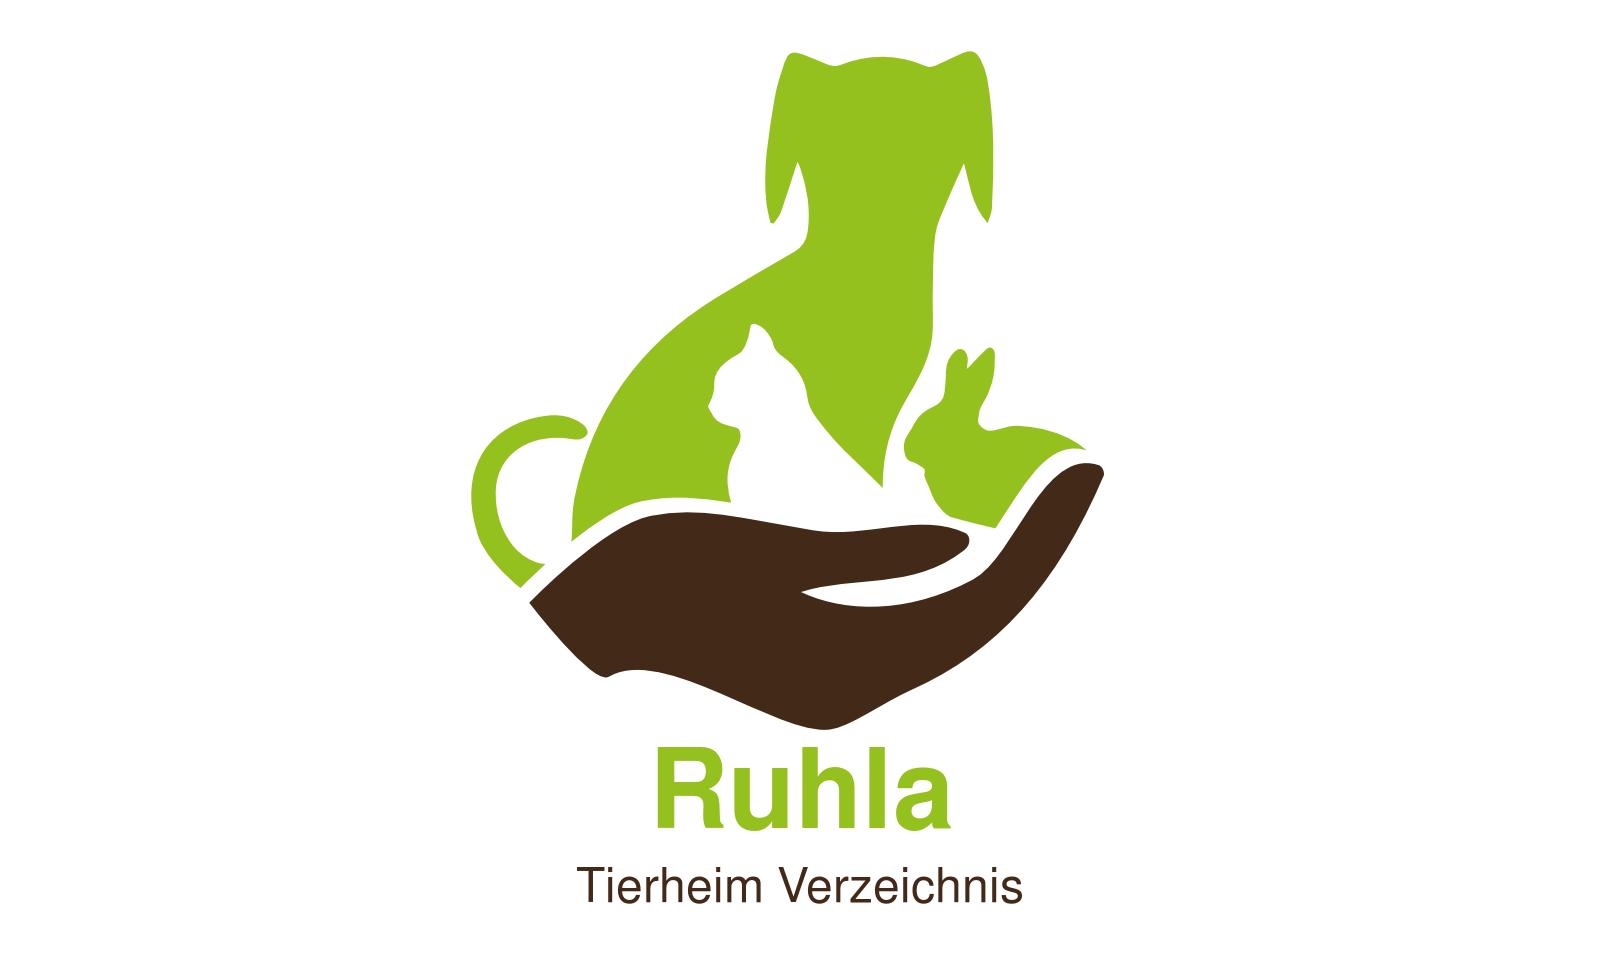 Tierheim Ruhla